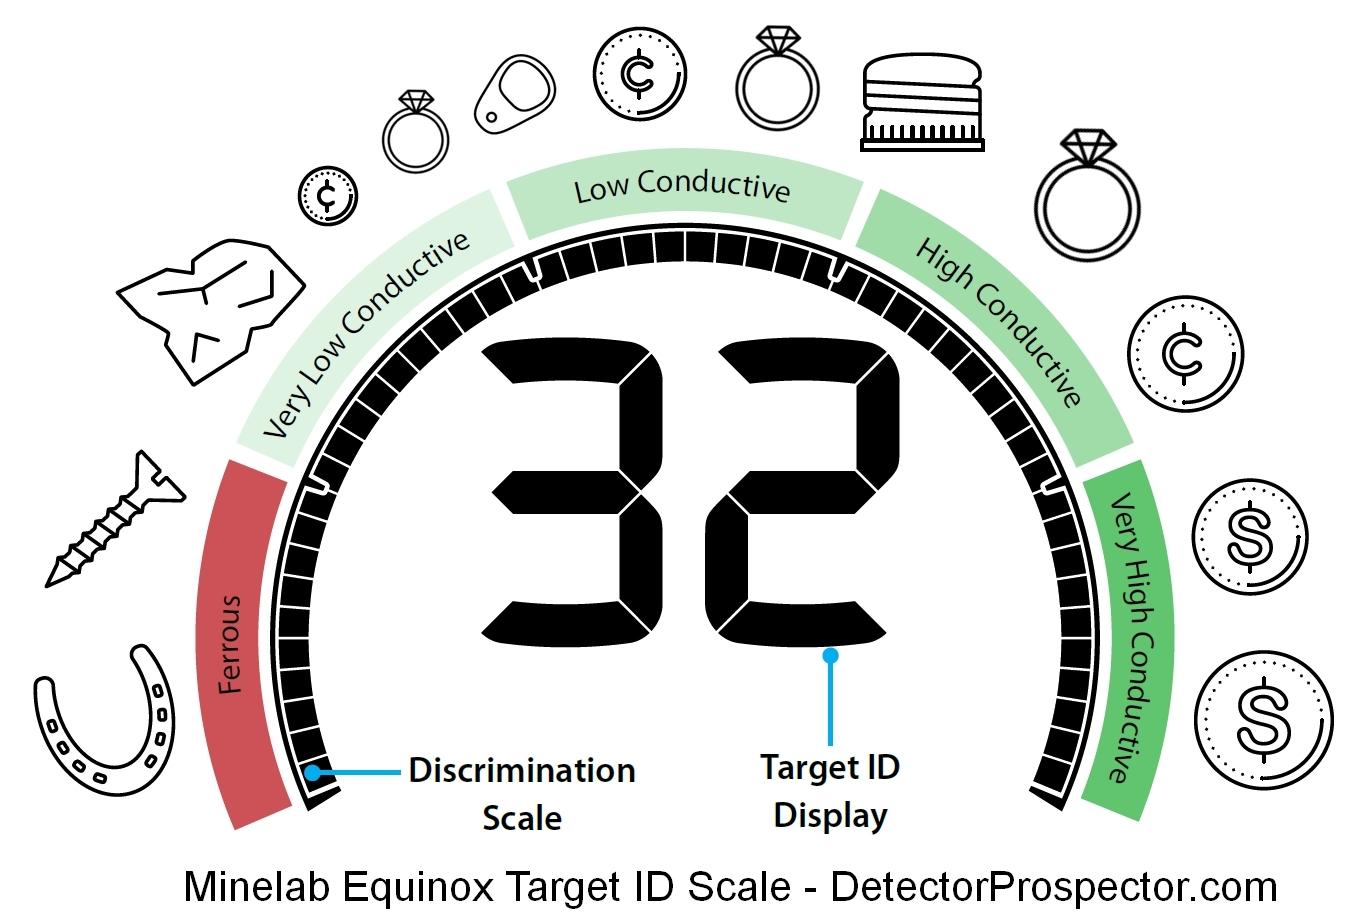 minelab-equinox-basic-target-id-scale.jpg